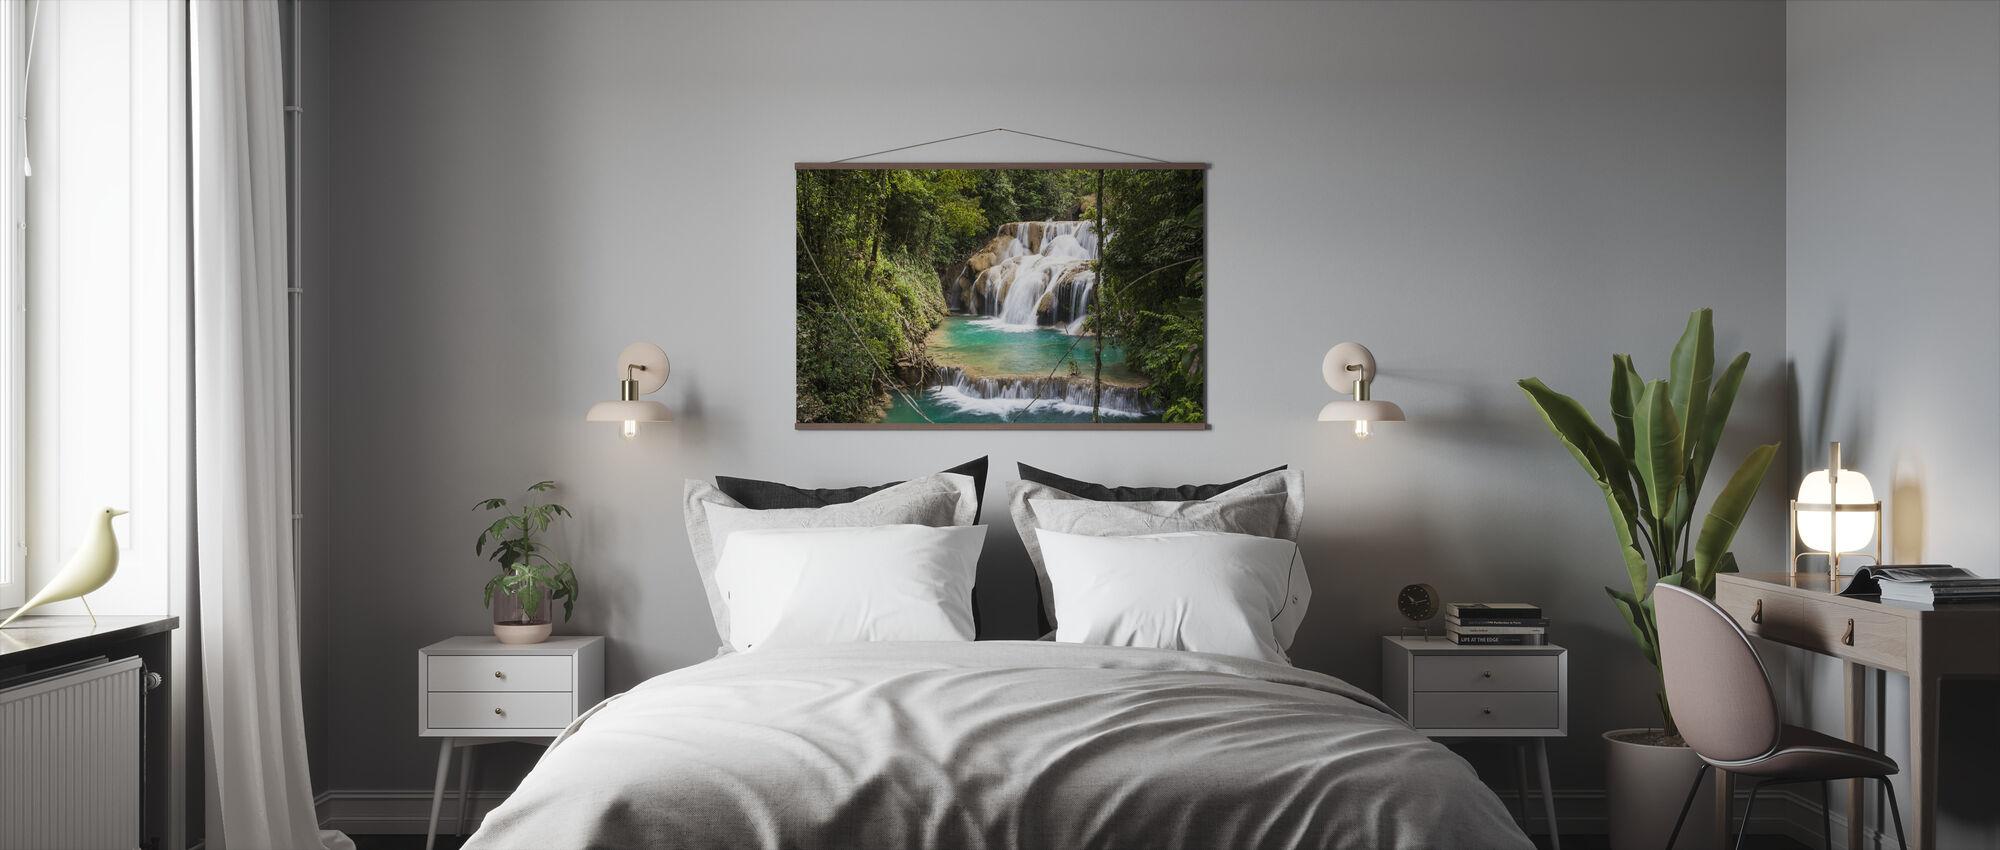 Las Golondrinas Watervallen - Poster - Slaapkamer